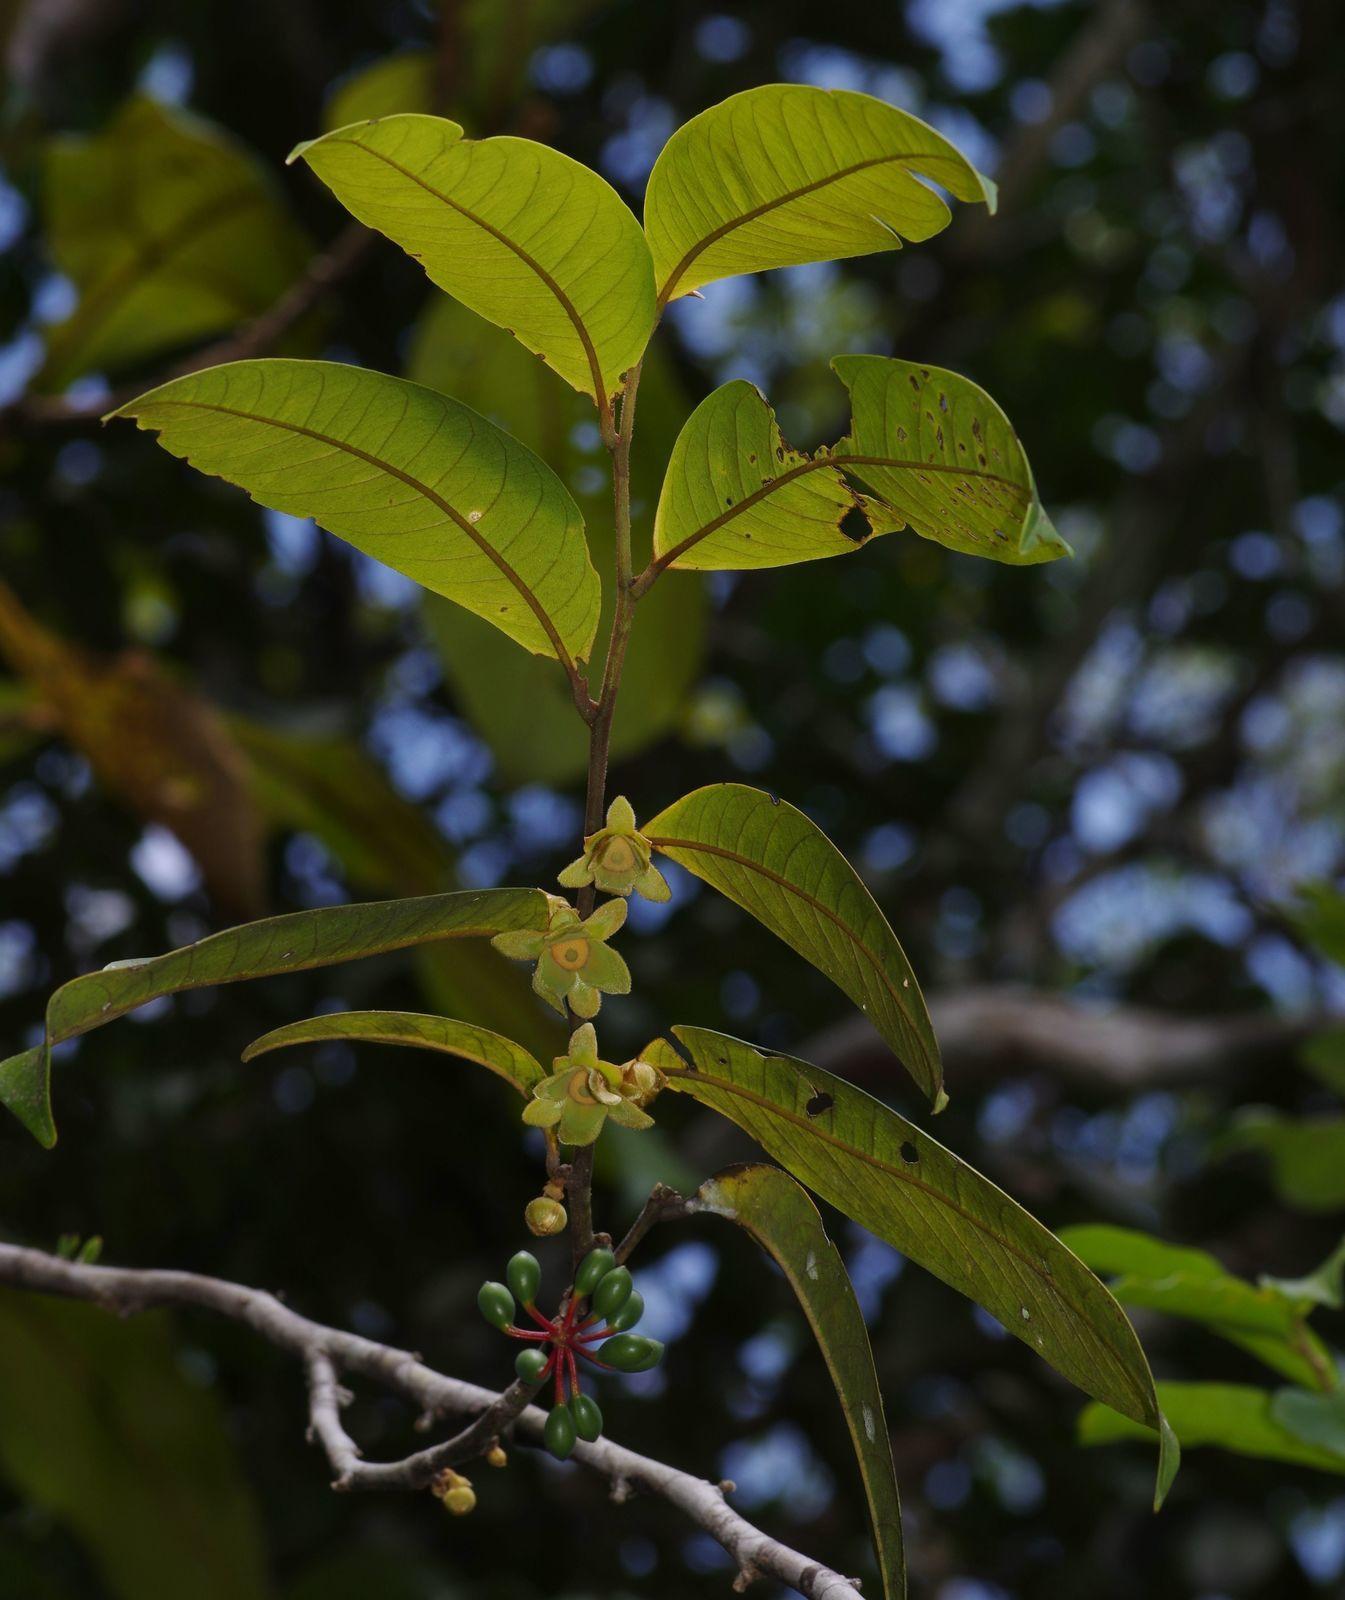 Guatteria richardii